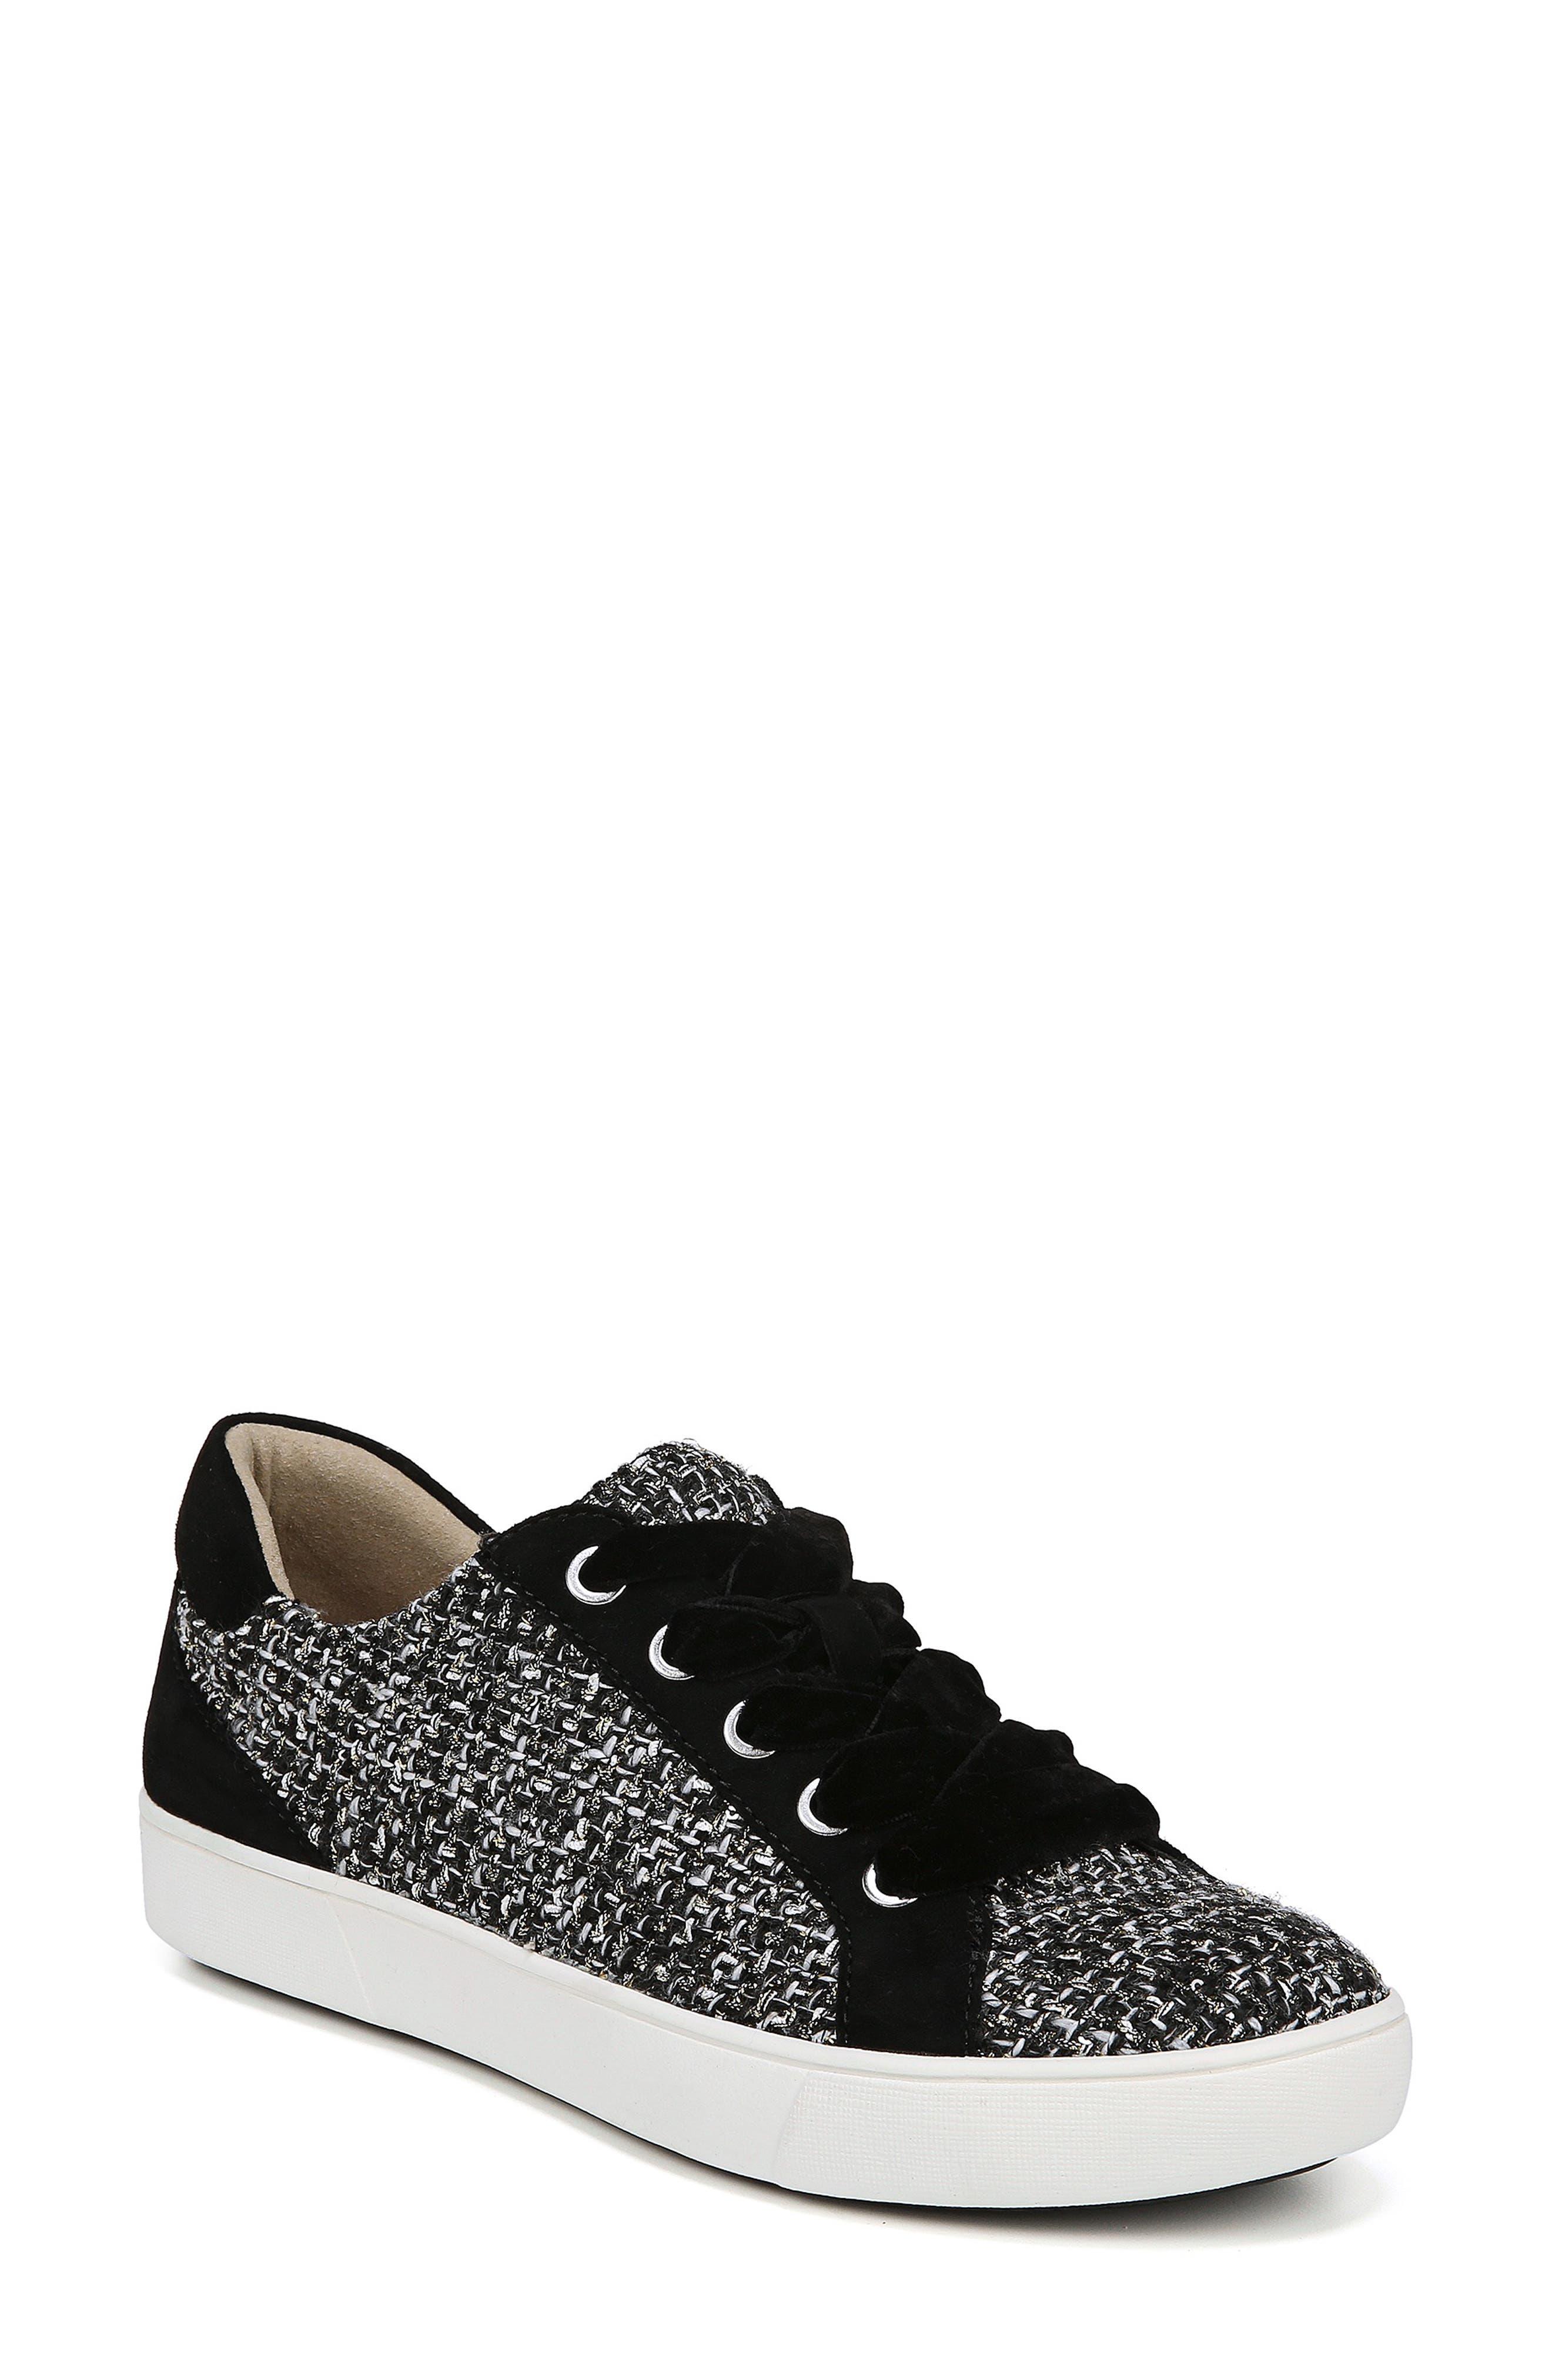 Morrison Sneaker,                         Main,                         color, BLACK/ WHITE TWEED FABRIC